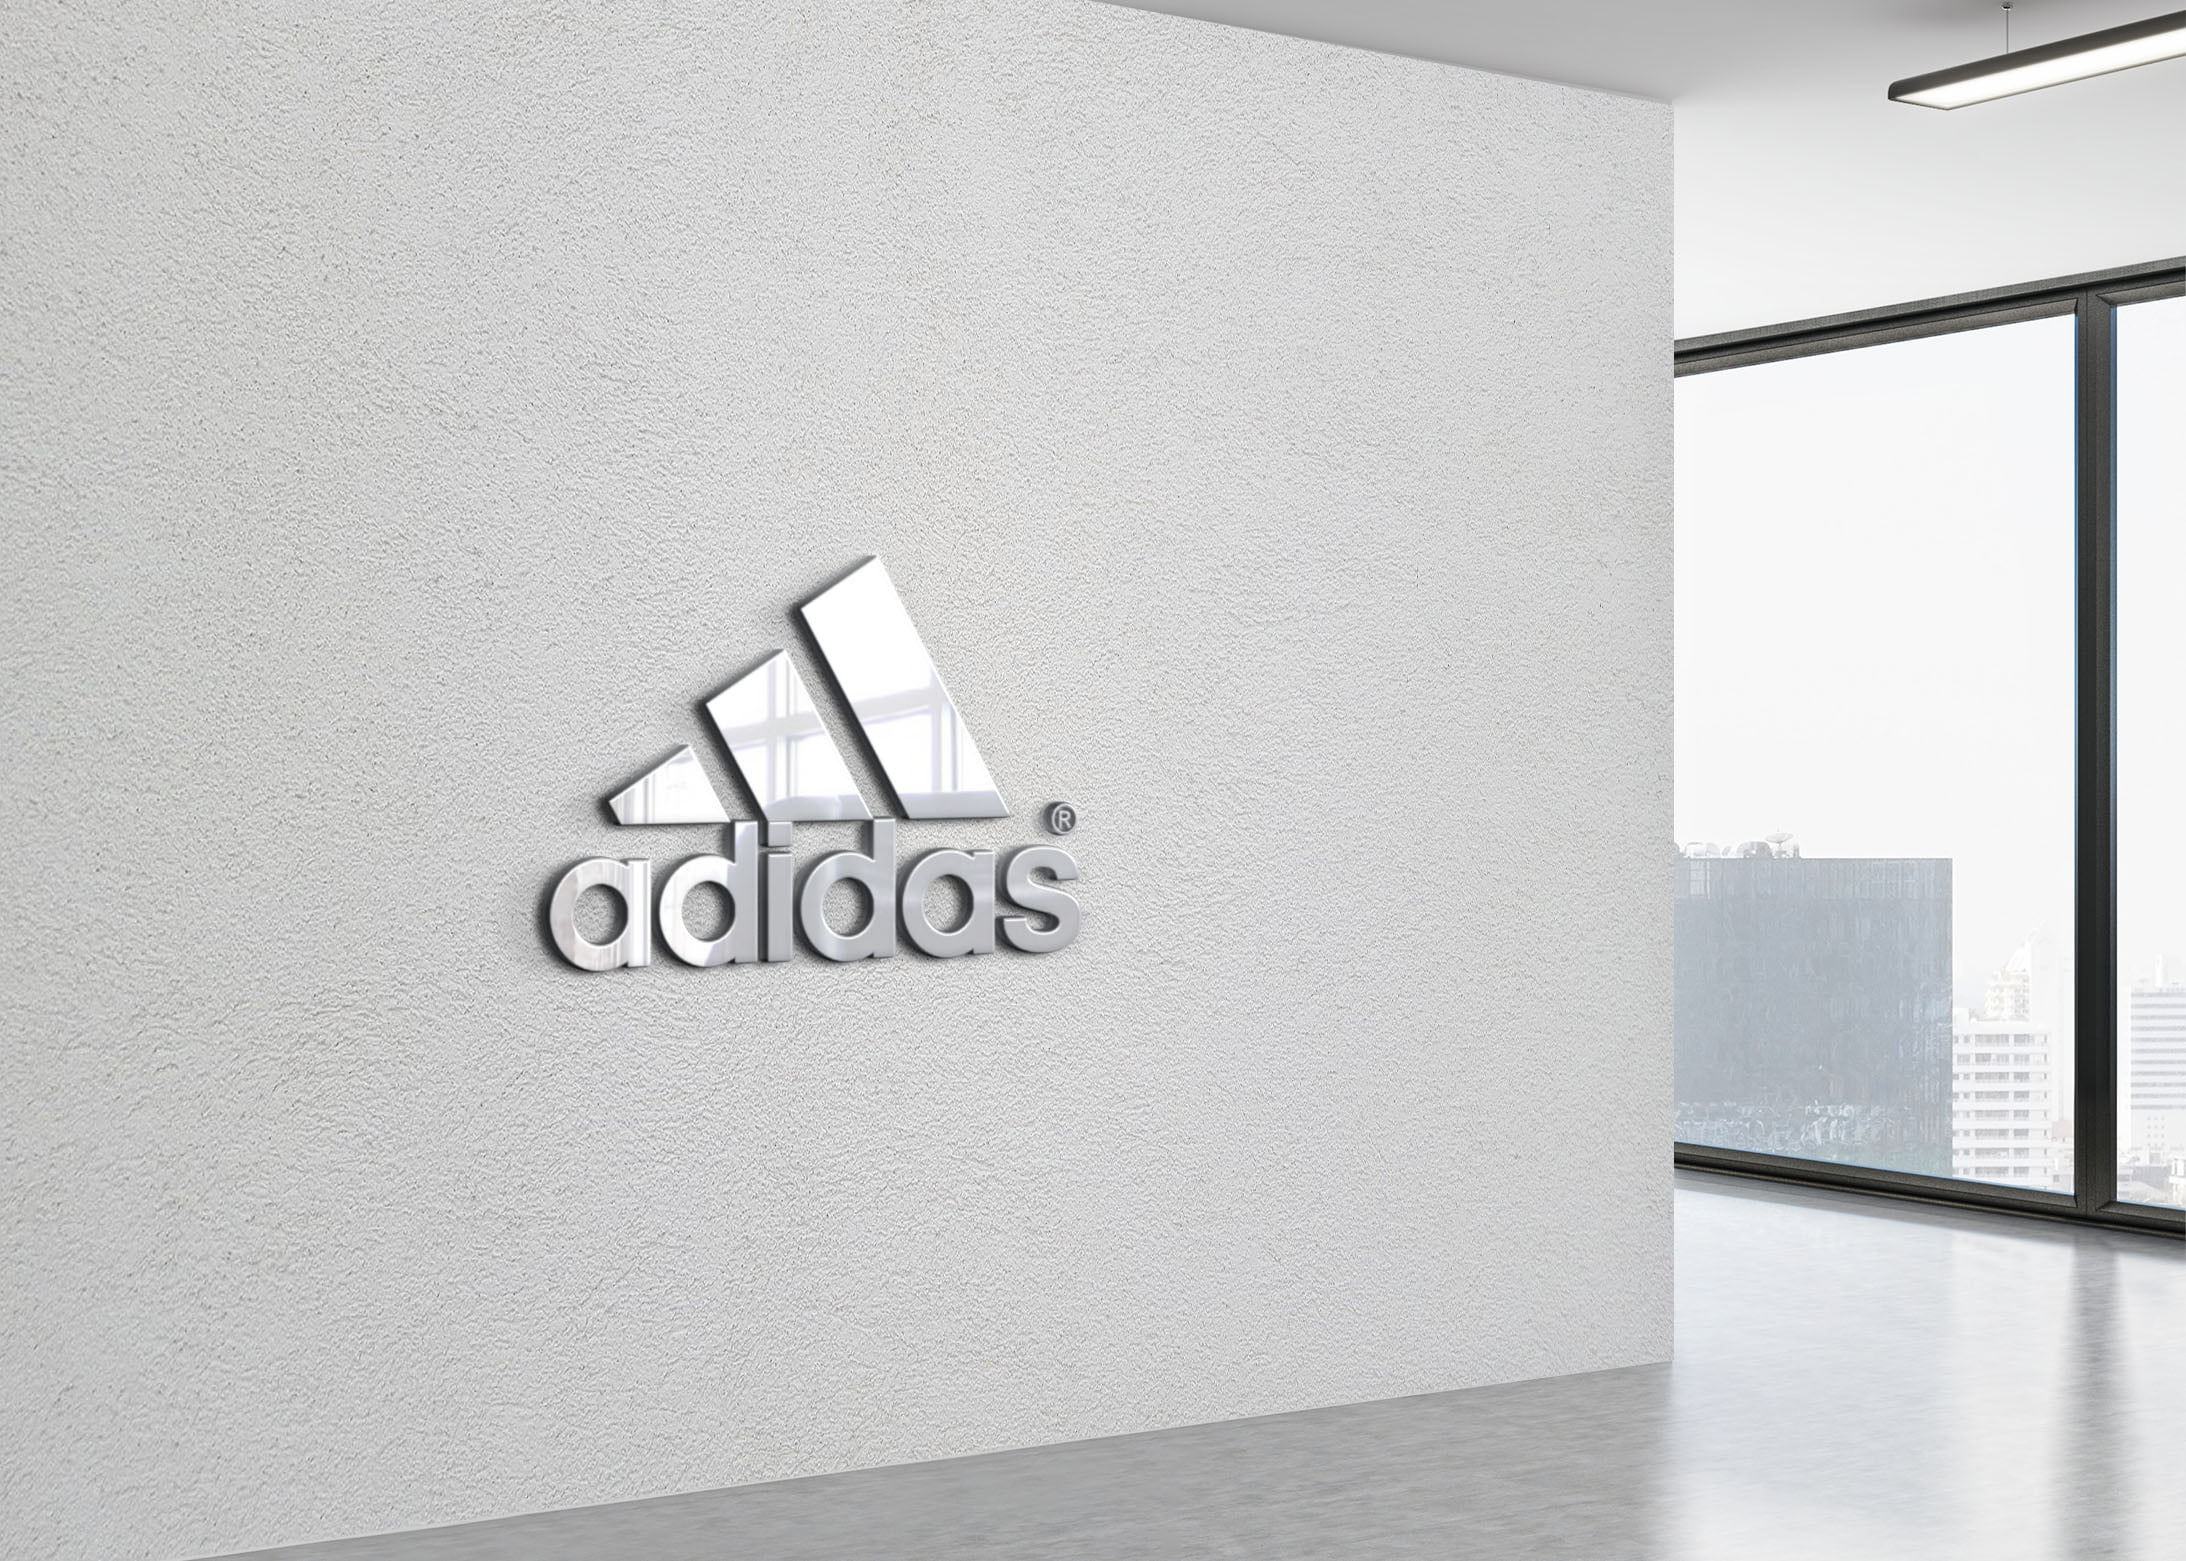 Adidas on 3d office wall logo mockup